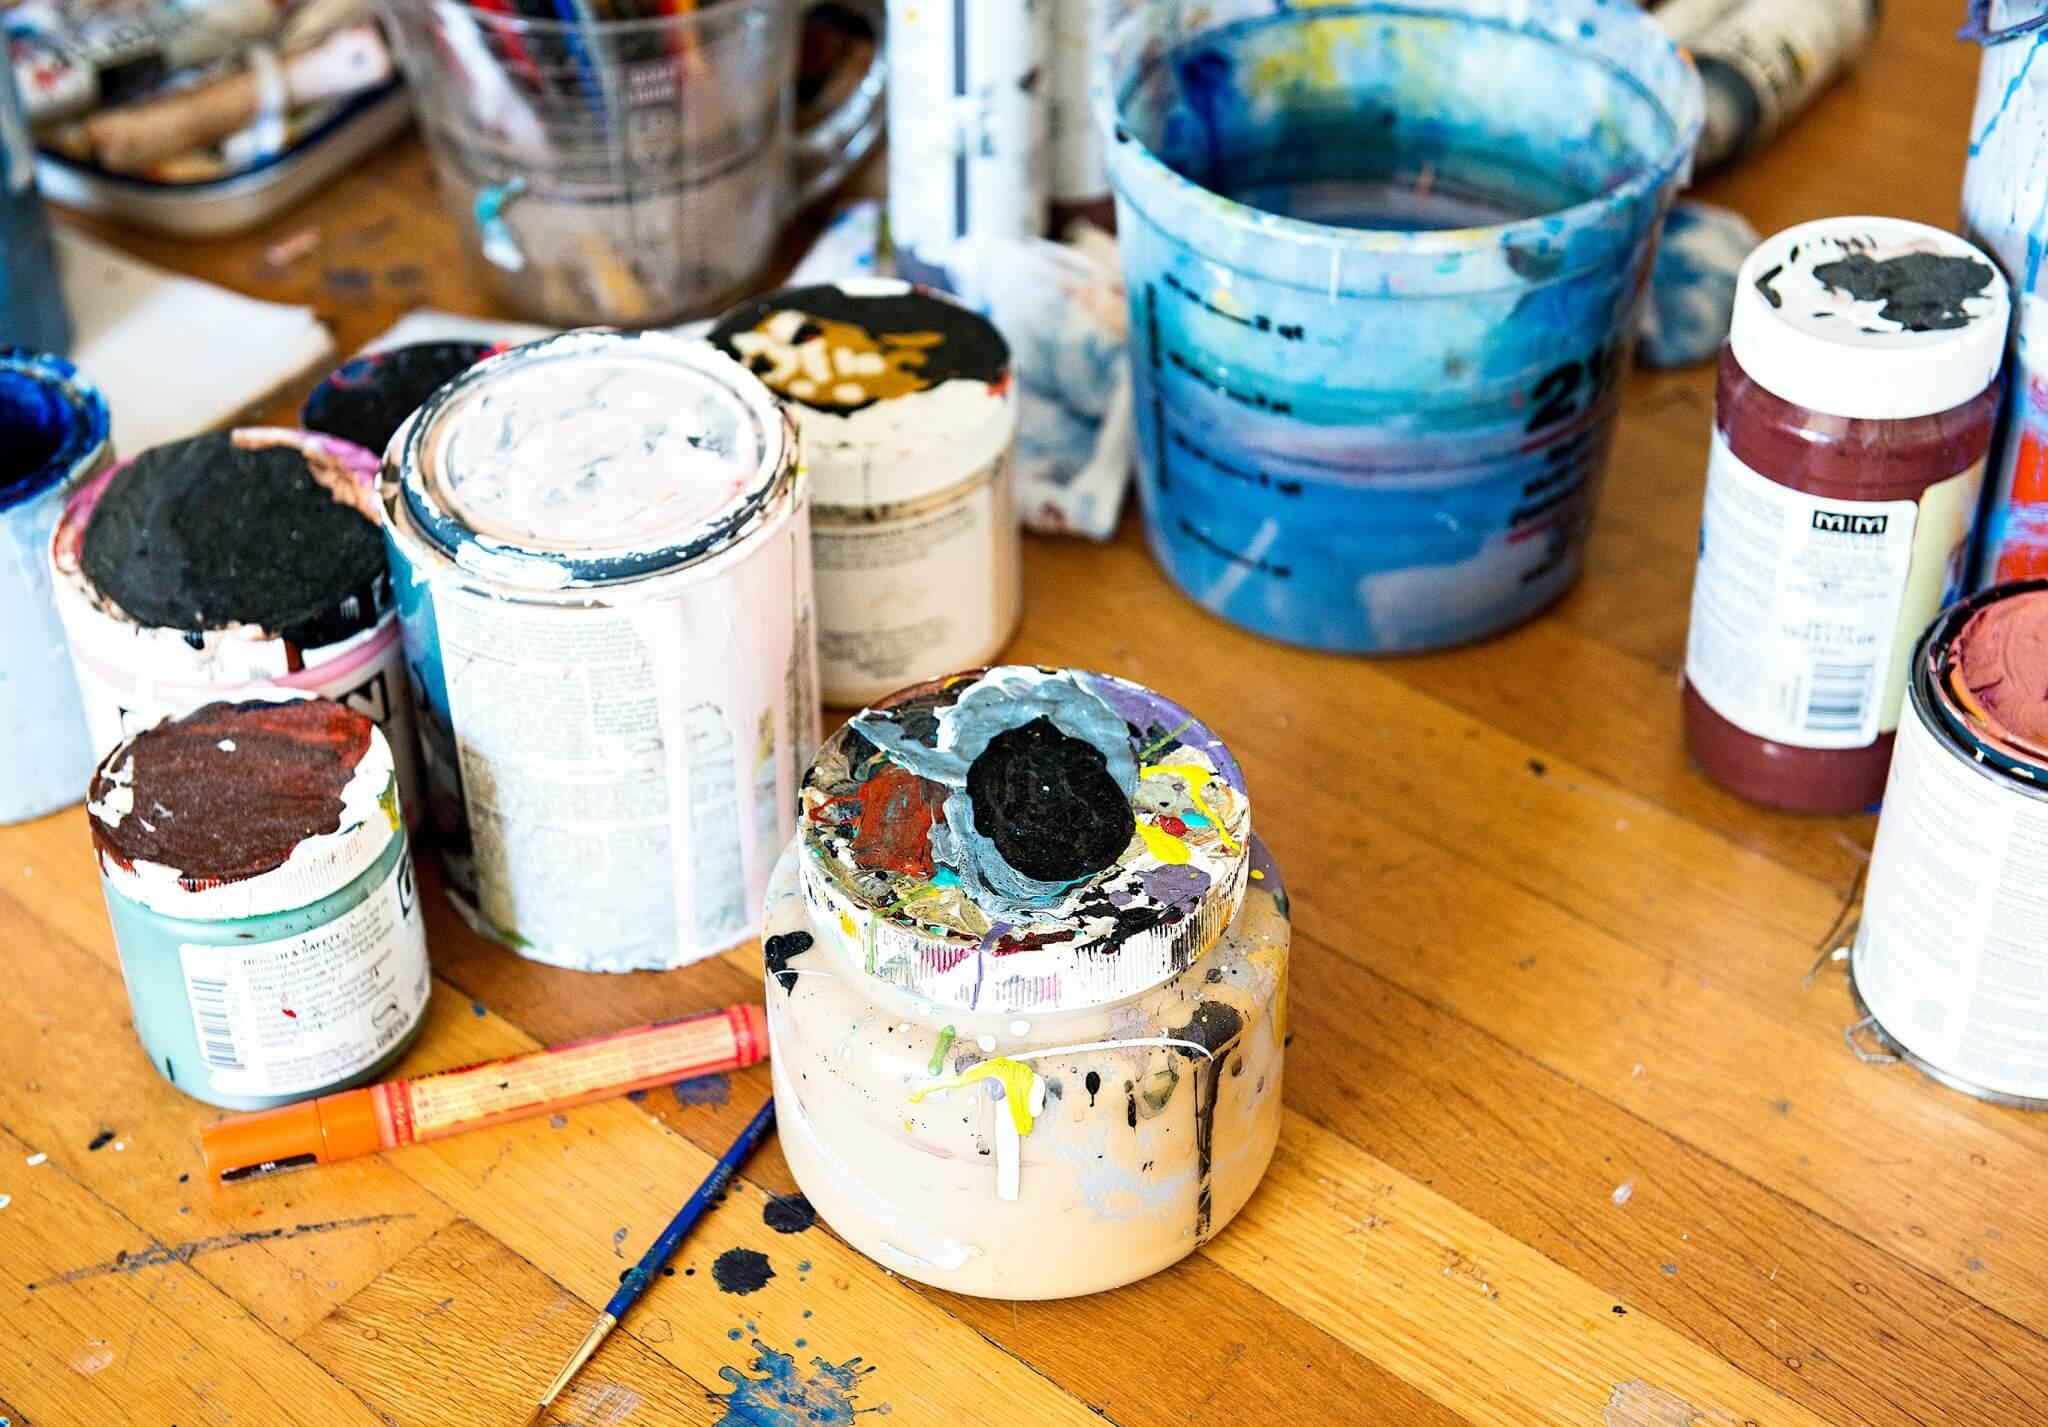 Paint cans on studio floor